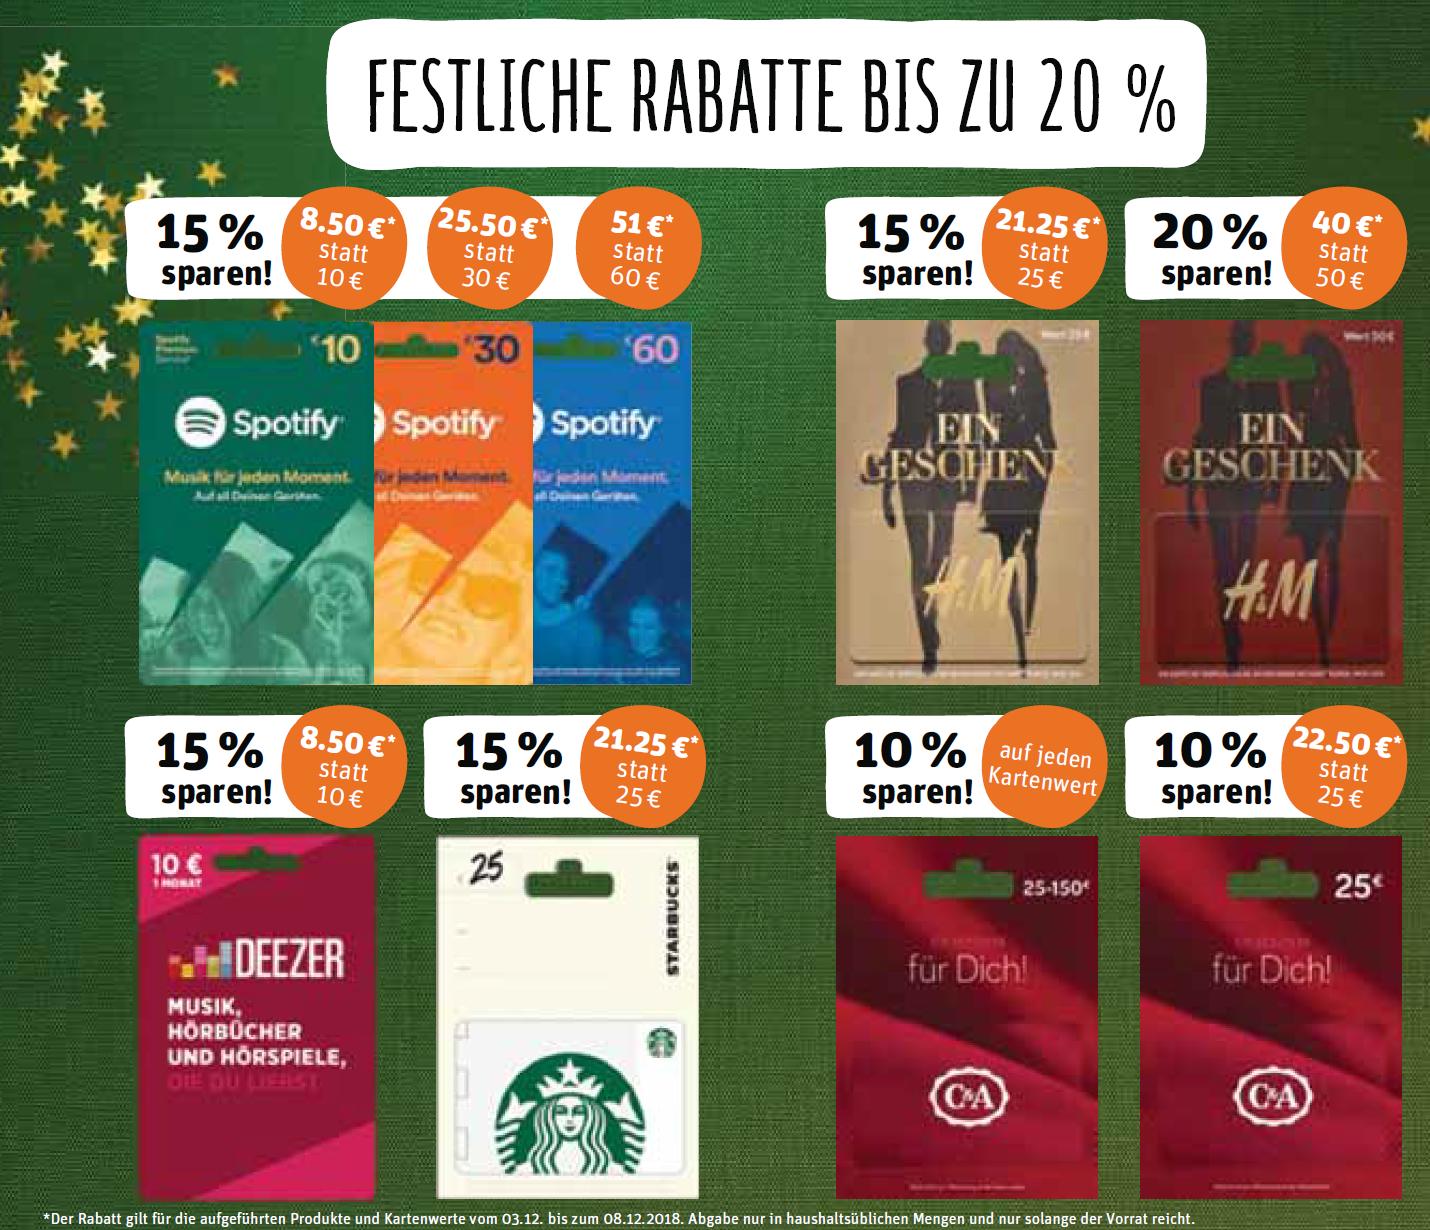 Paypal Karte Rewe.20 Rabatt Auf H M 15 Deezer Spotify Starbucks 10 C A